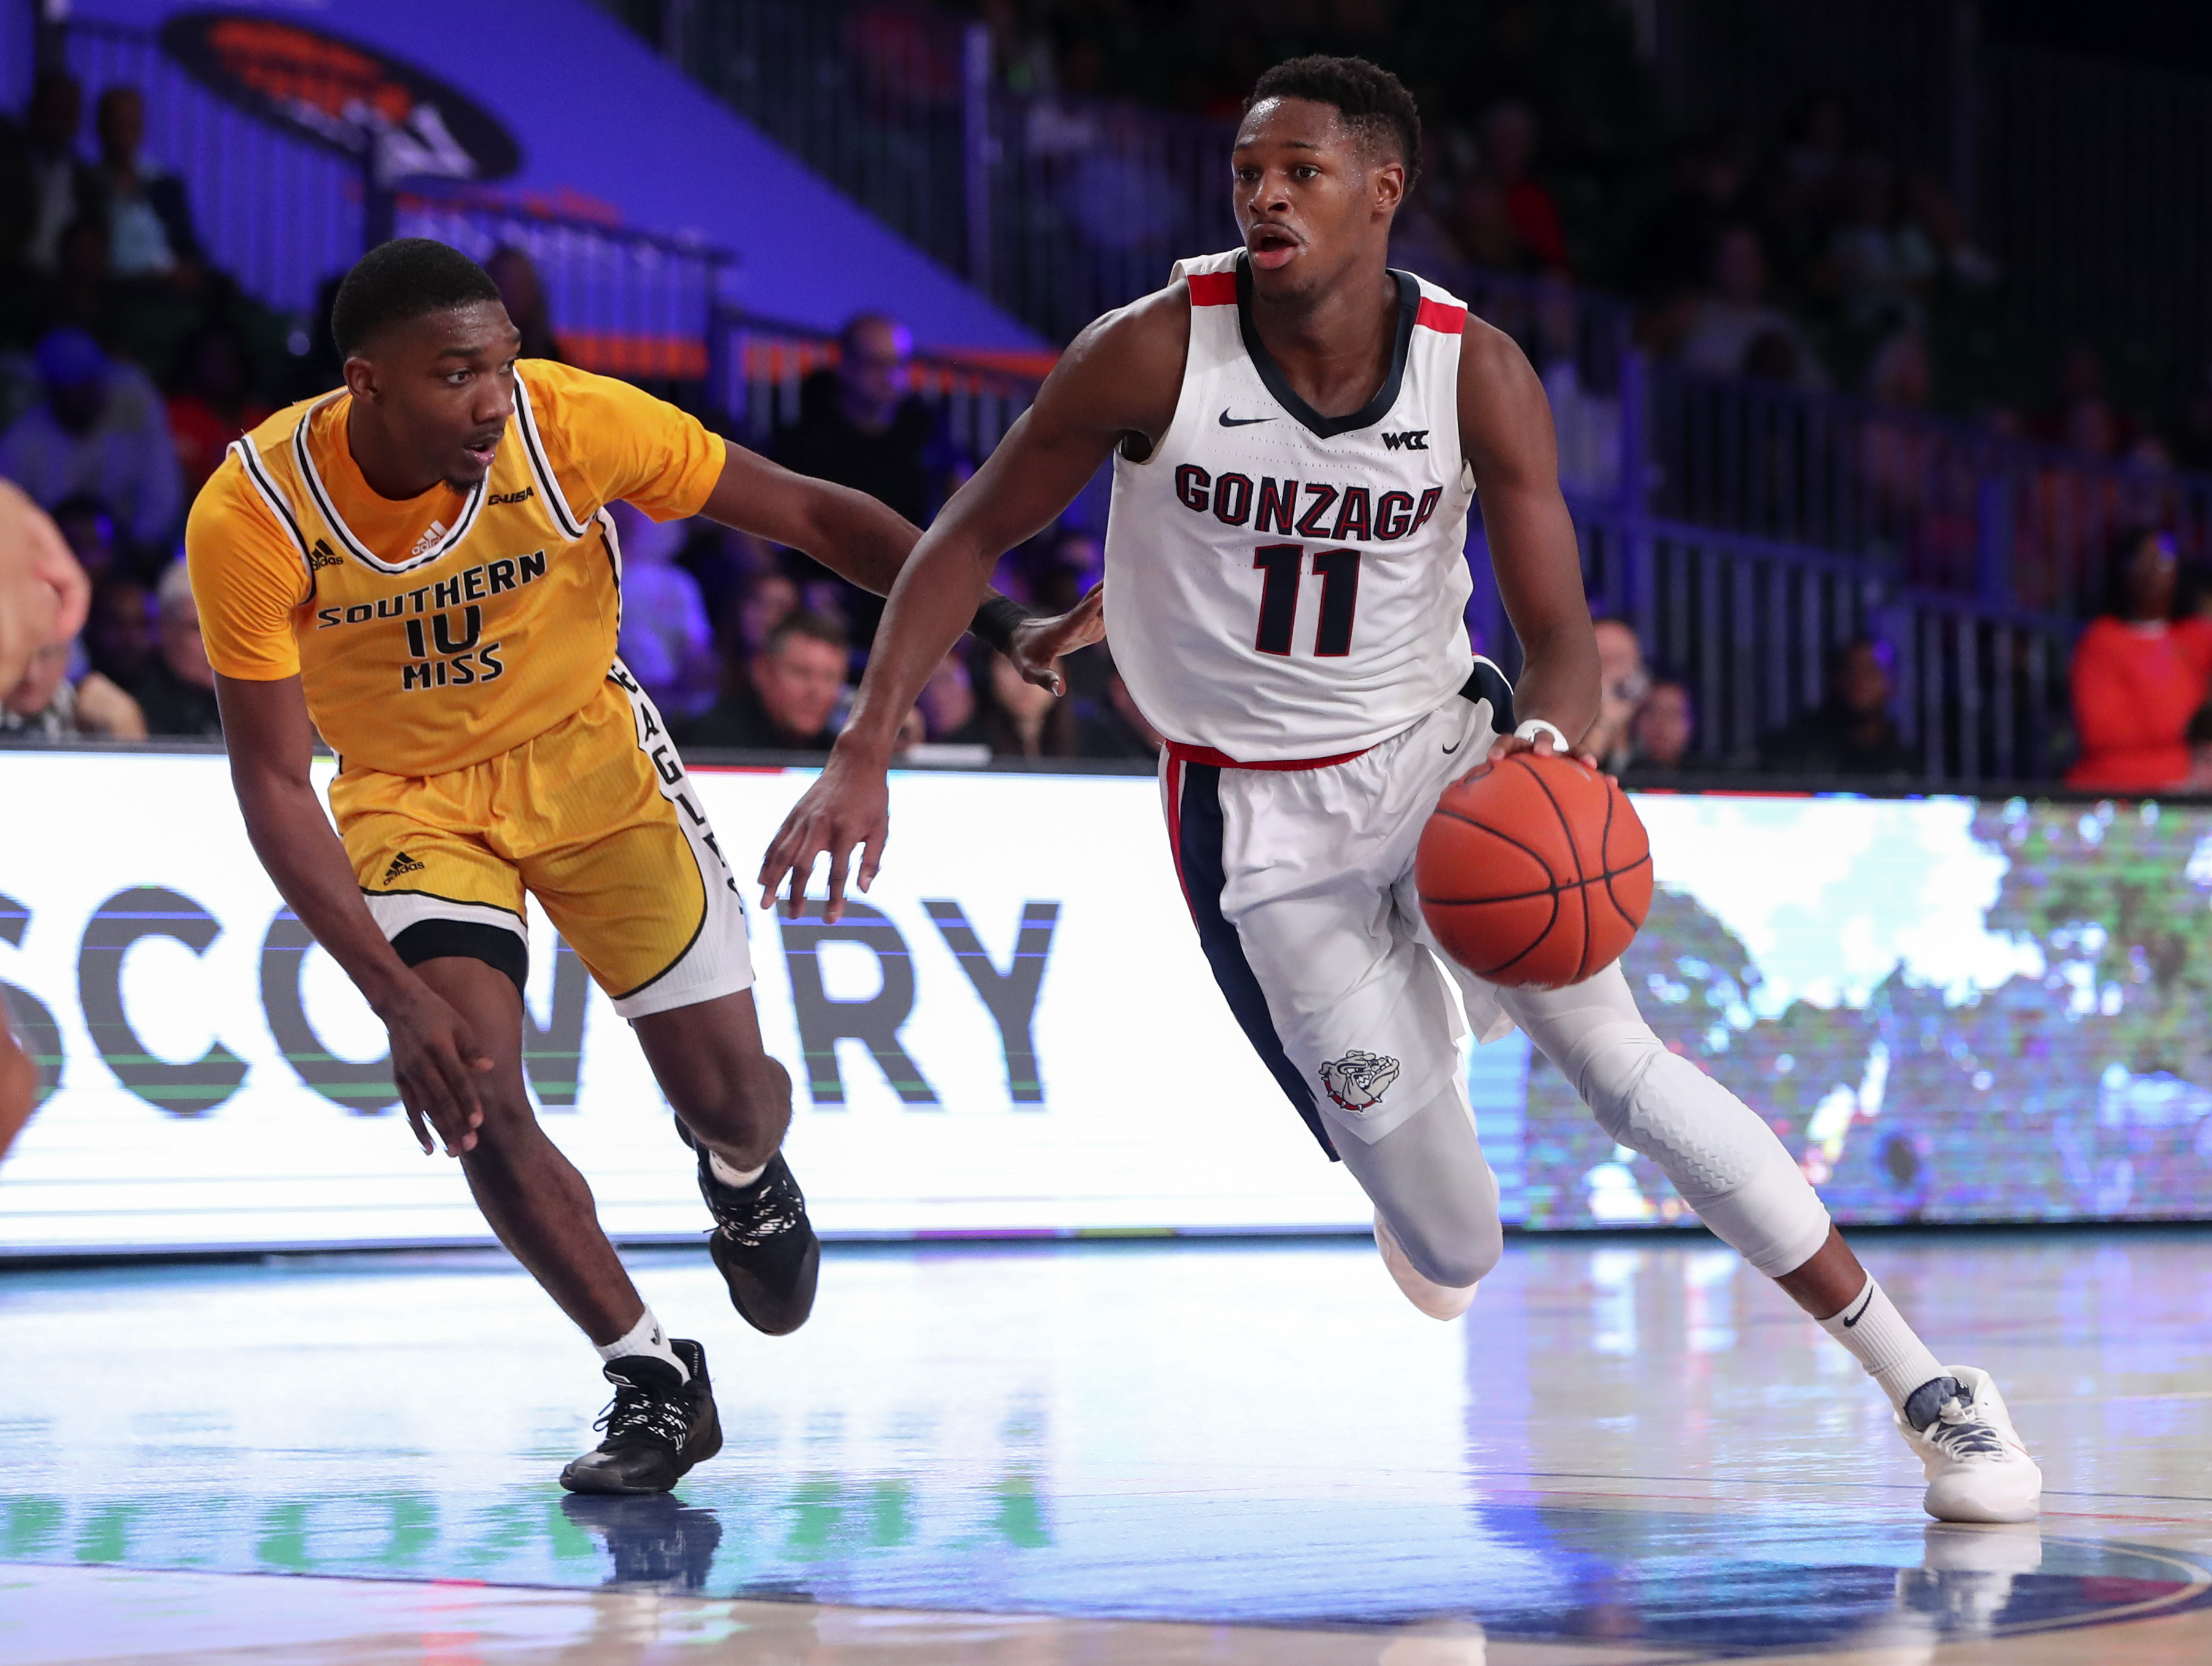 NCAA Basketball: Battle 4 Atlantis-Gonzaga at Southern Mississippi